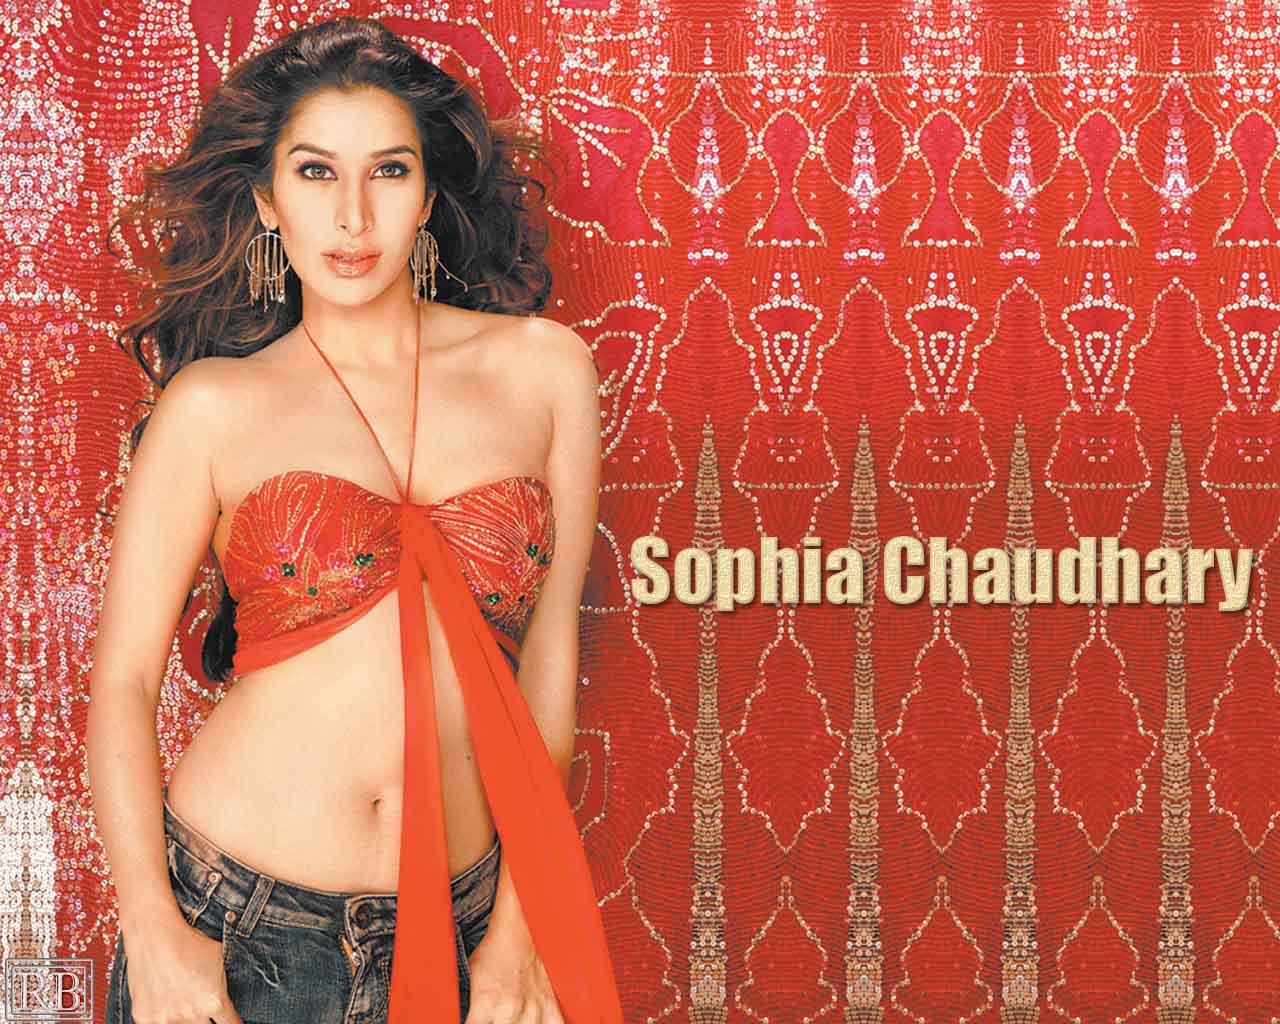 http://4.bp.blogspot.com/-P9Y_Dvyqeq4/ThrXi0_Zr7I/AAAAAAAAFas/DXRUyFFGDfQ/s1600/Bollywood+Actress+super+Wallpapers25.jpg